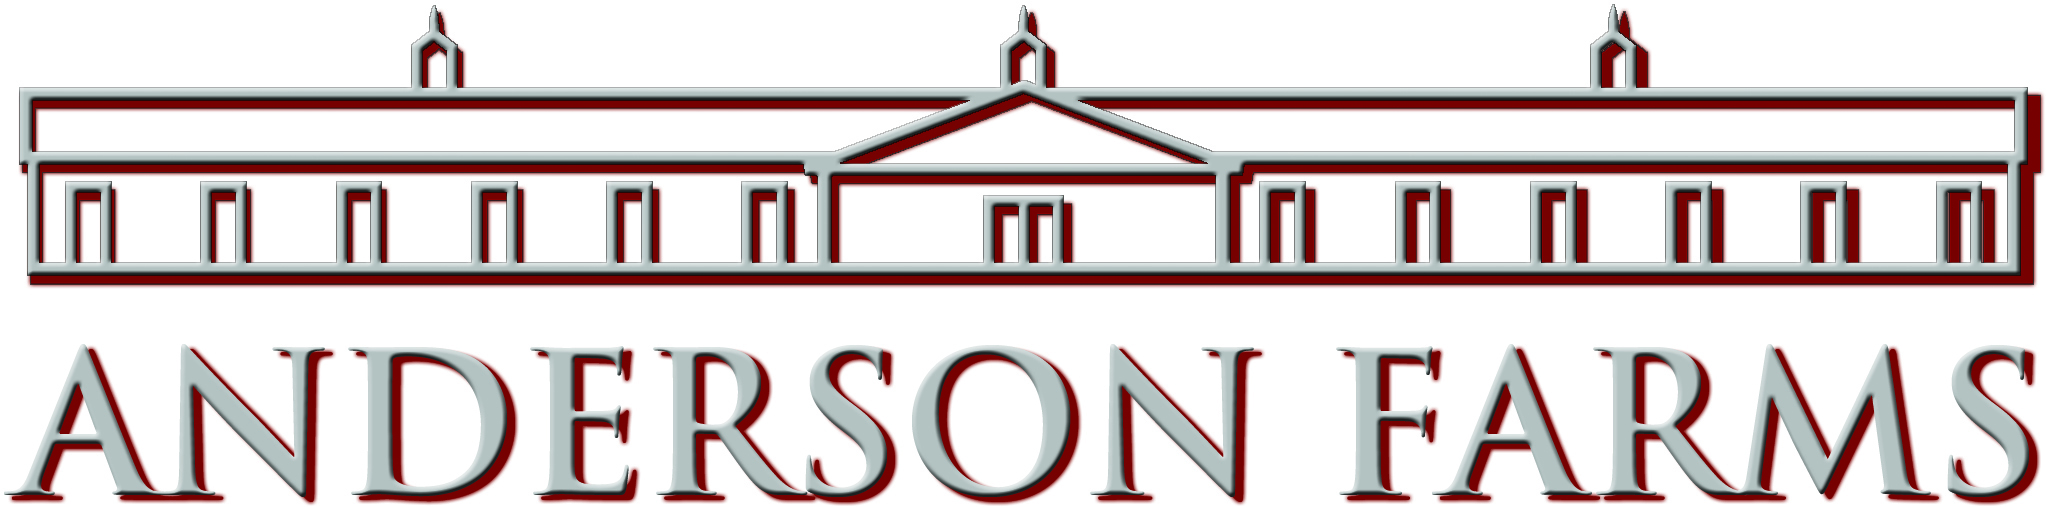 ANDERSON FARMS.Open6.WesternRiding.EnglishRiding.YouthWesternRiding.YouthEnglishRiding..jpg